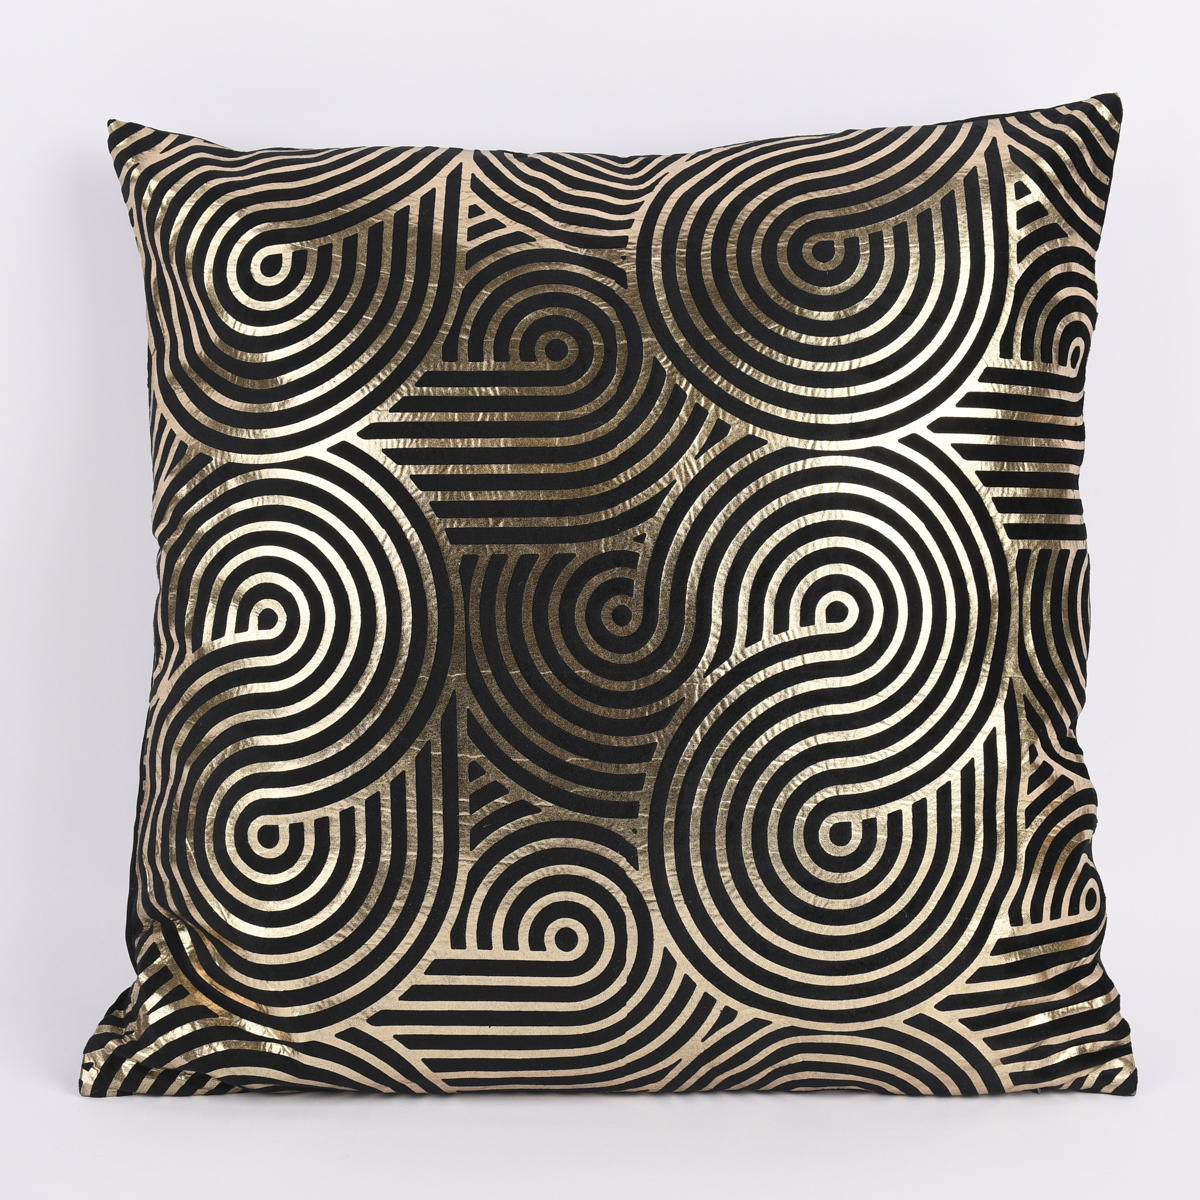 Temerity Jones Deko Kissen Samtoptik schwarz goldfarbig 45x45cm verschiedene Designs